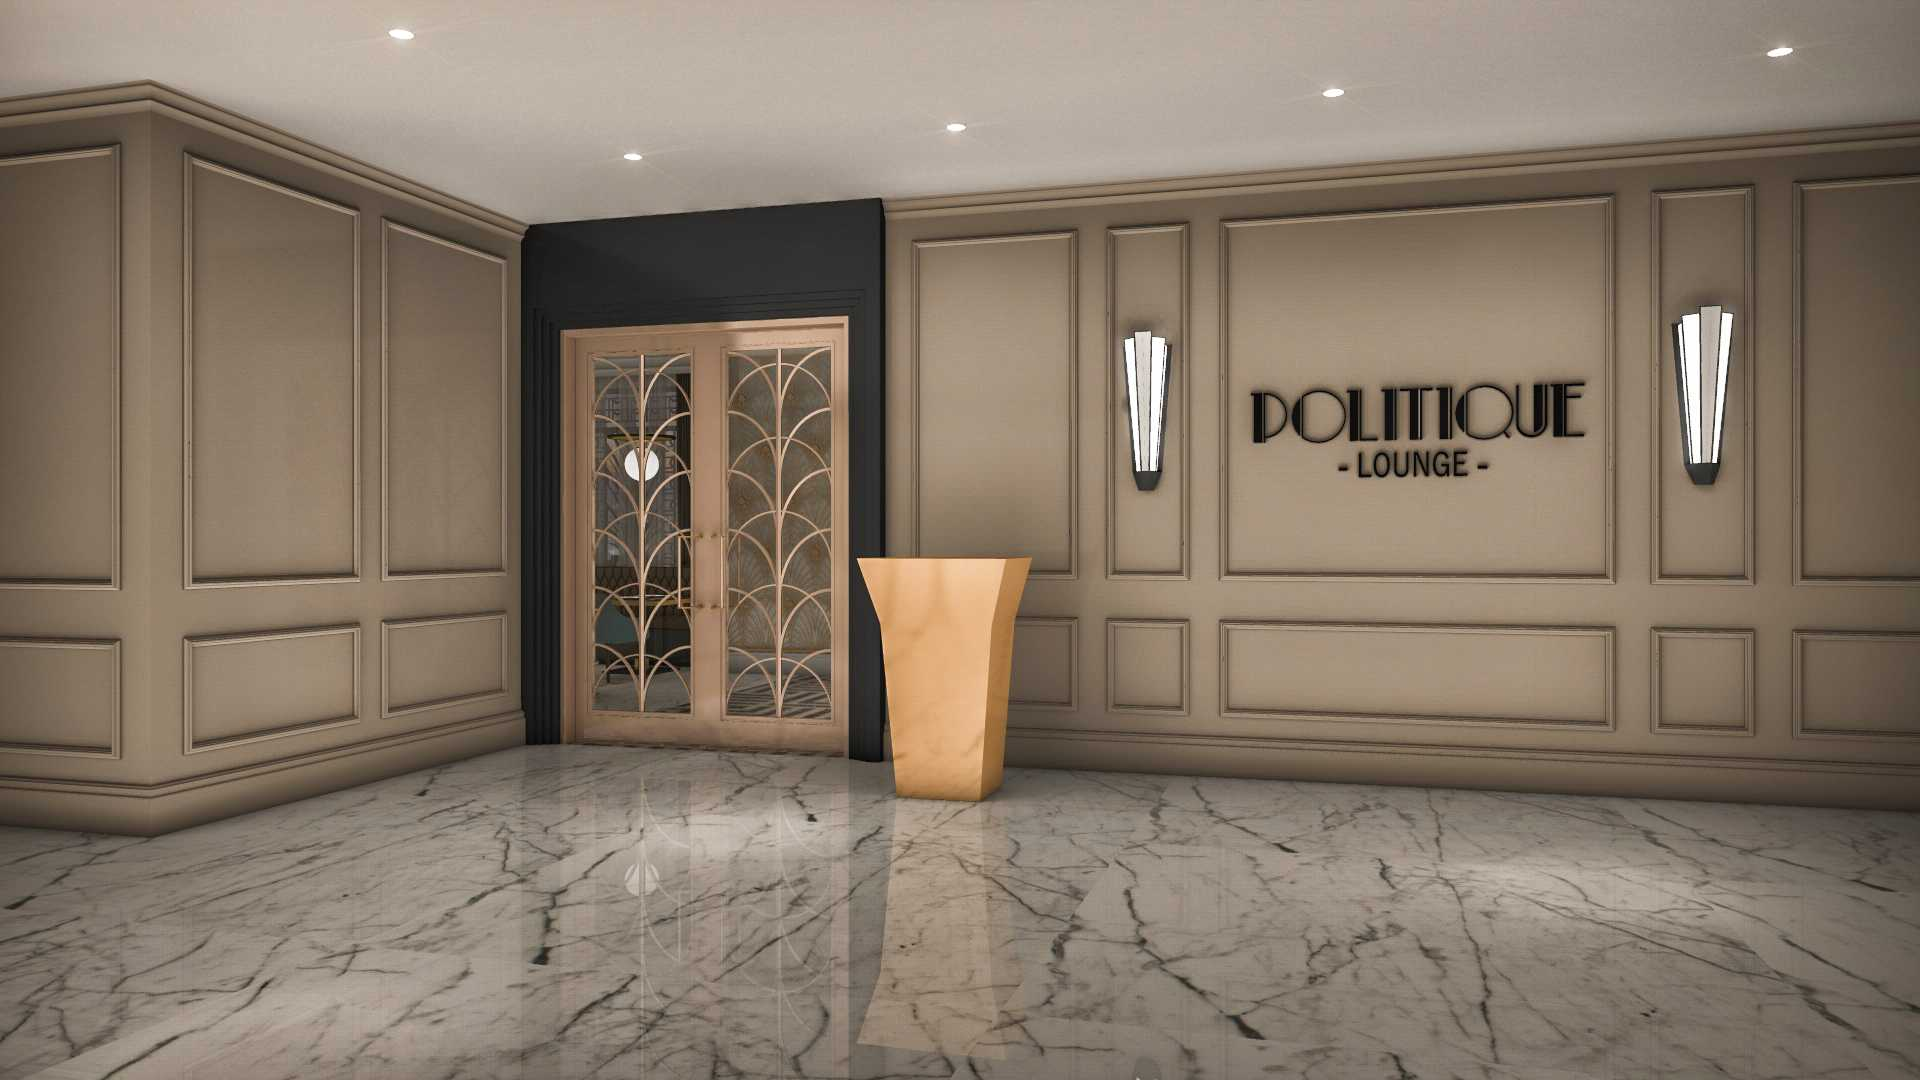 Vindo Design Politique Lounge Slipi, Palmerah, Kota Jakarta Barat, Daerah Khusus Ibukota Jakarta, Indonesia Slipi, Palmerah, Kota Jakarta Barat, Daerah Khusus Ibukota Jakarta, Indonesia Politique Lounge Lobby Area Classic 63981